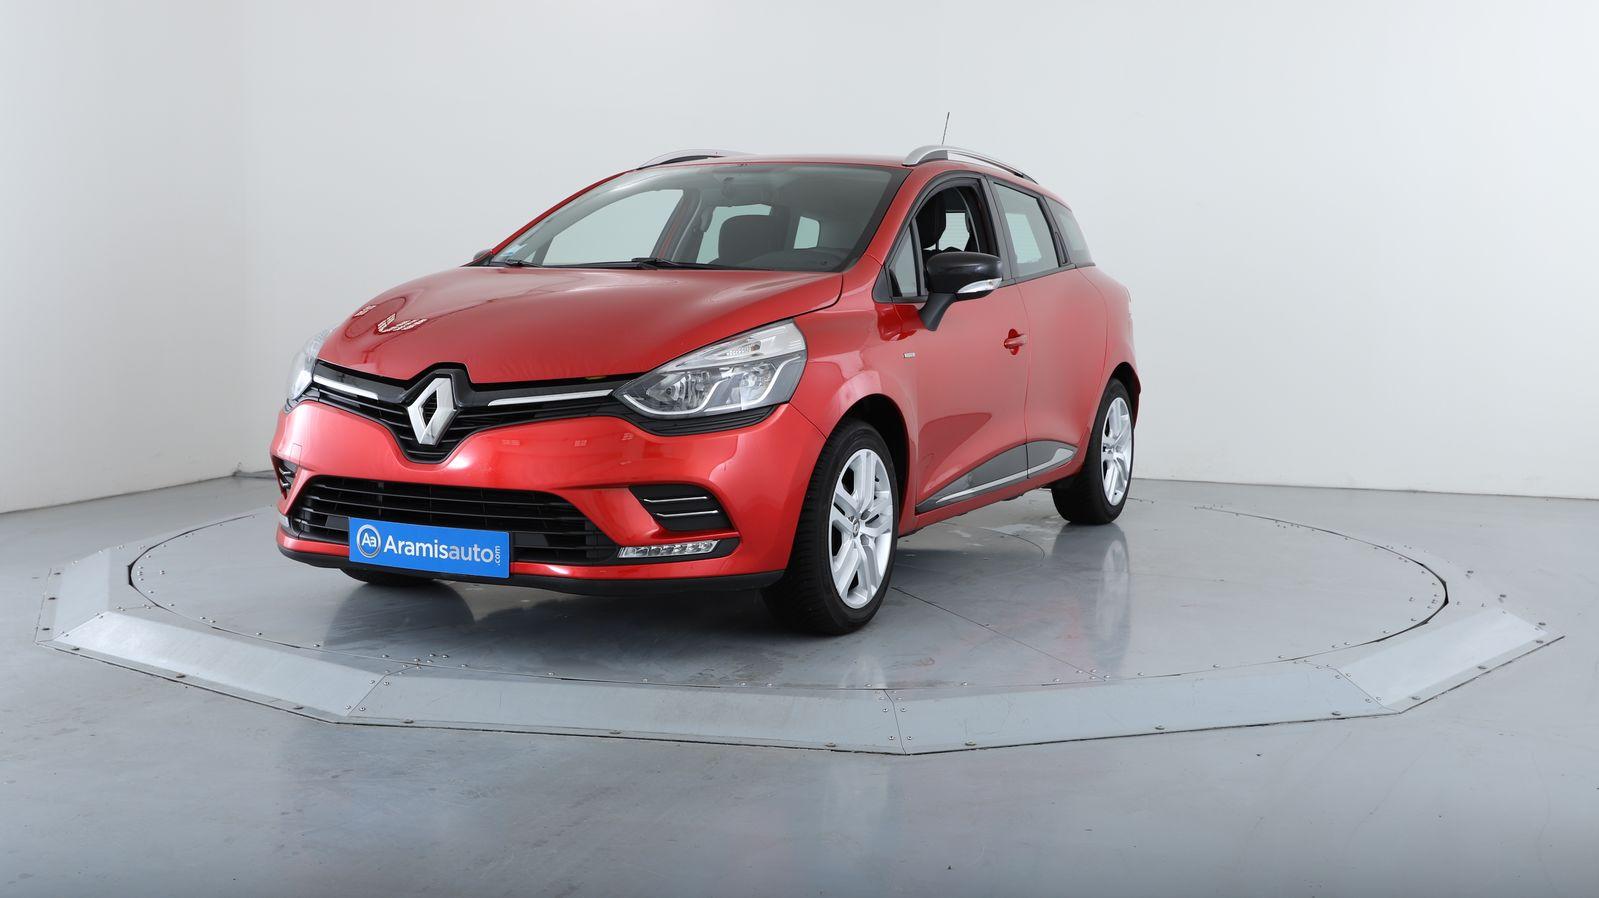 Renault Clio 4 Estate Break 5 Portes Essence 0 9 Tce 90 Bvm5 Boite Manuelle Finition Limited Rv435849 Aramisauto